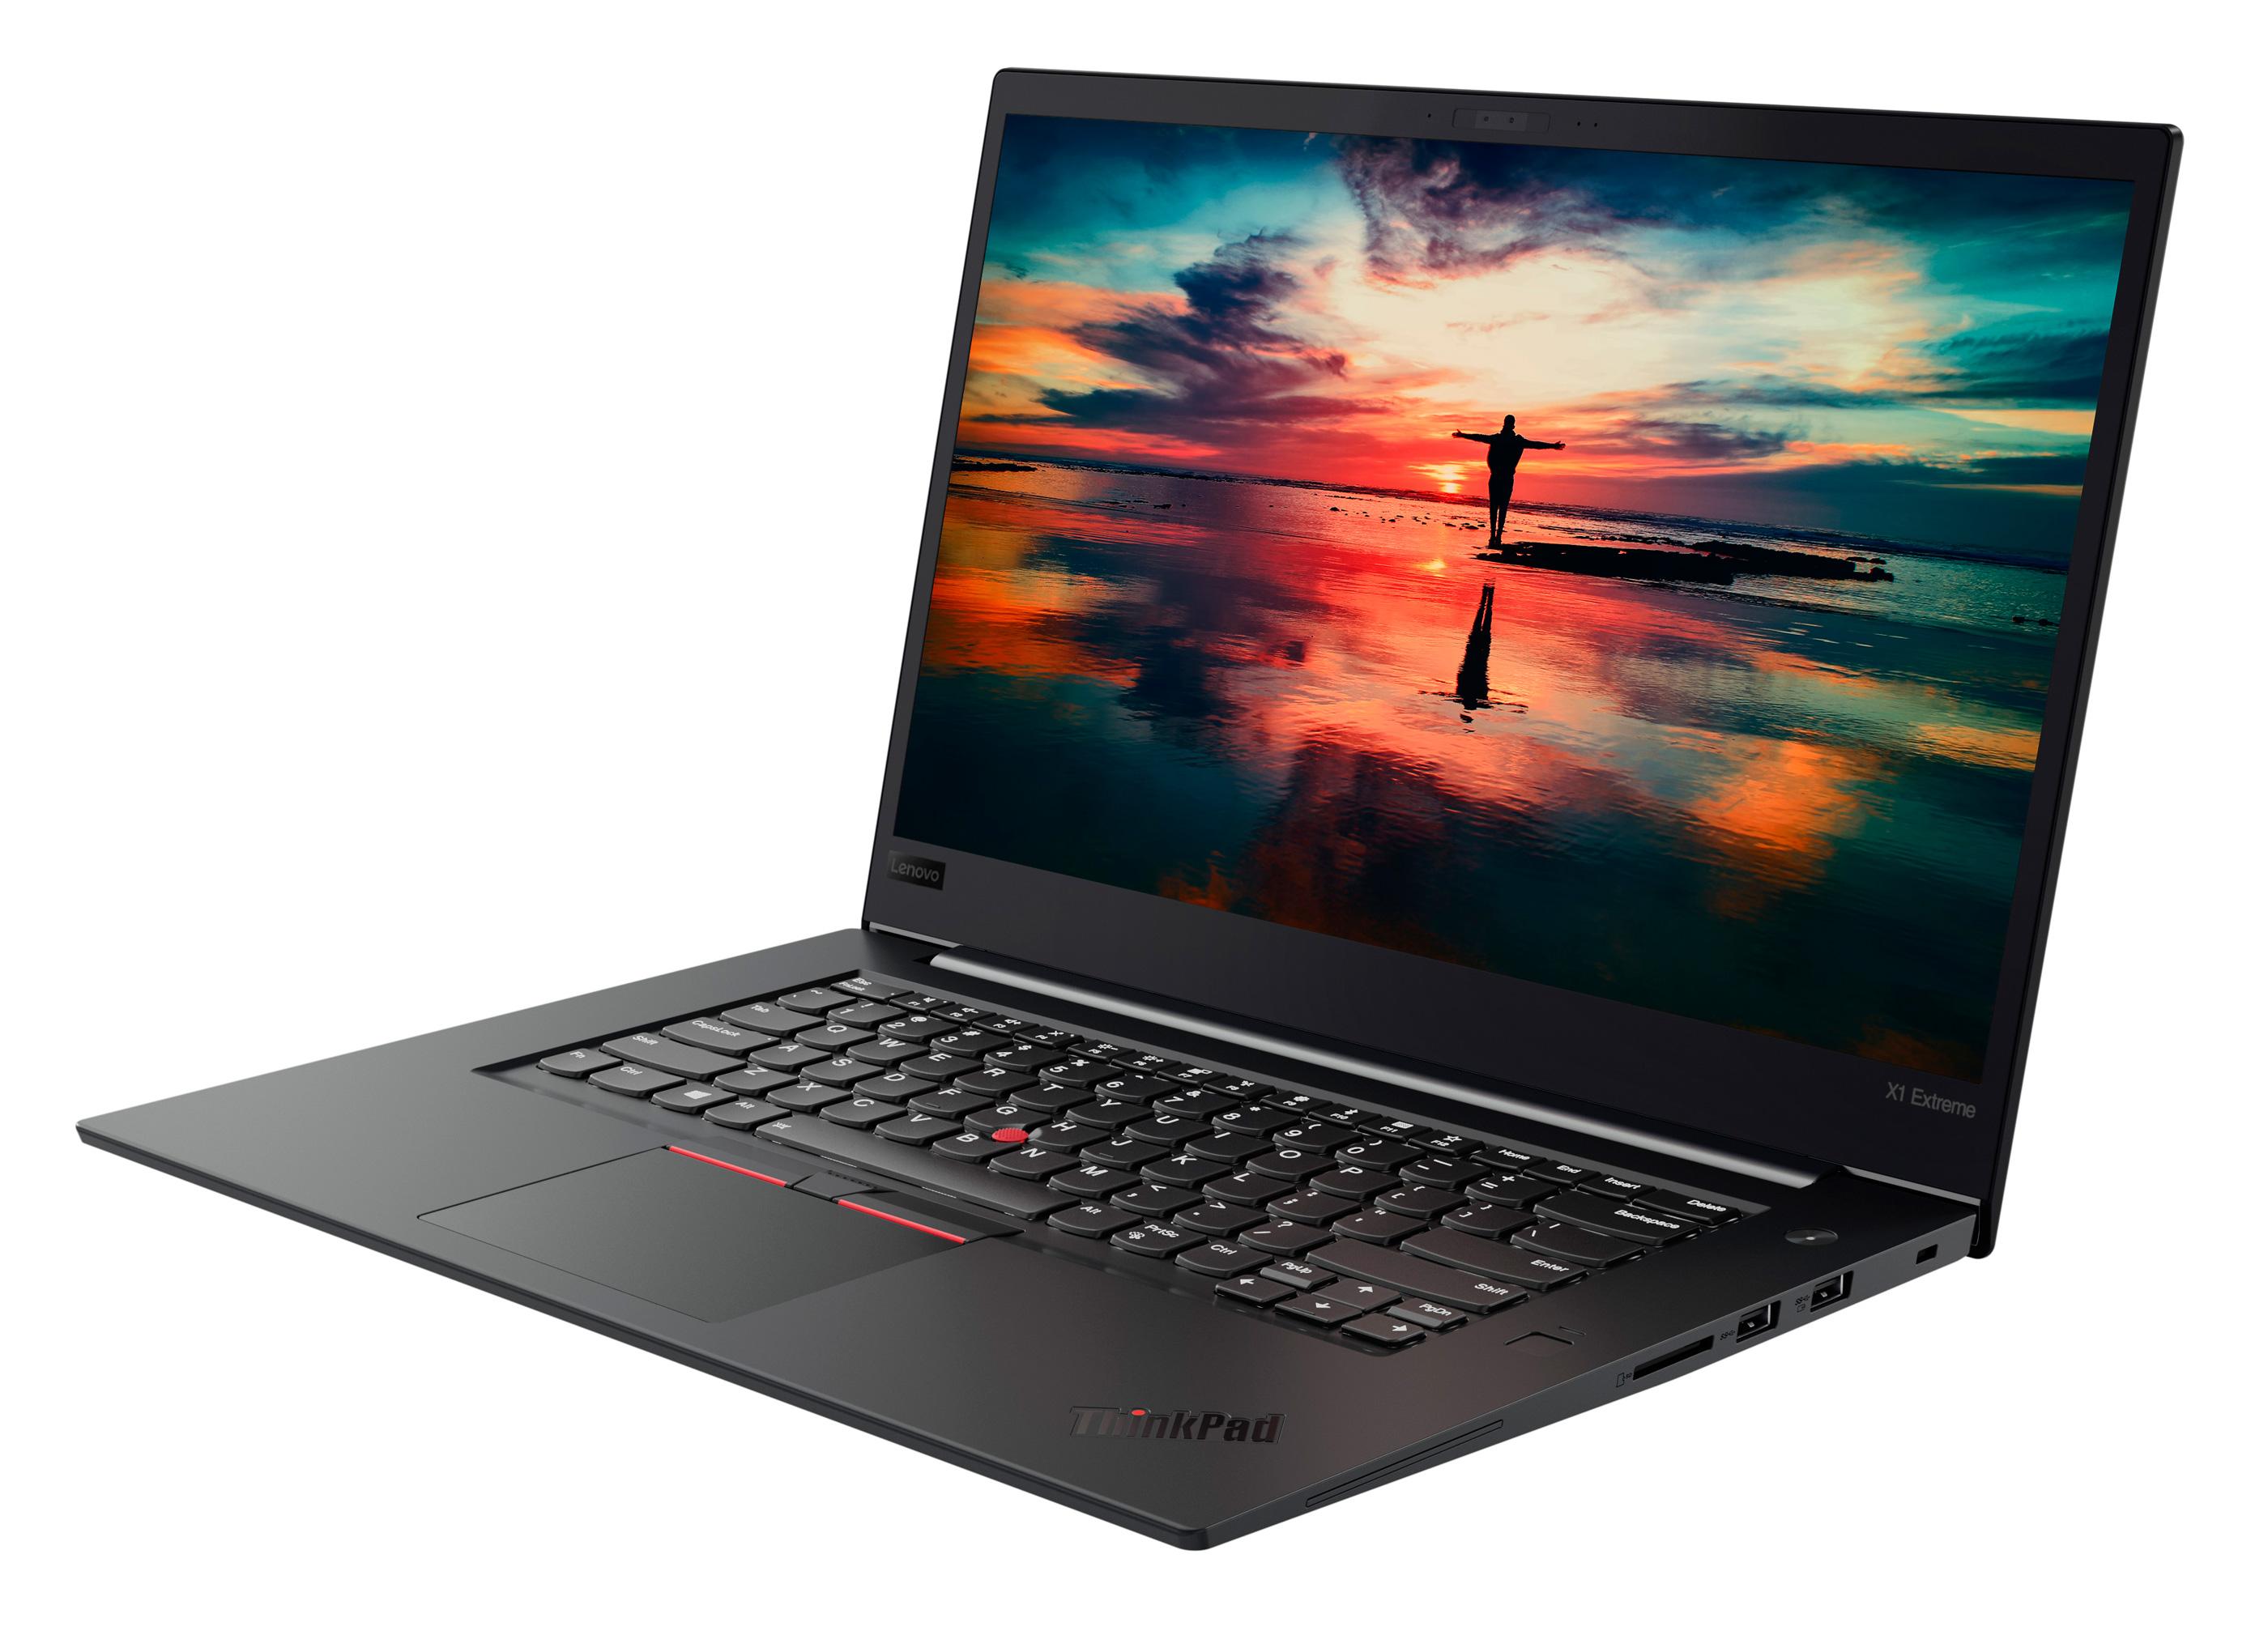 Фото  Ультрабук ThinkPad X1 Extreme 1st Gen (20MF000TRT)